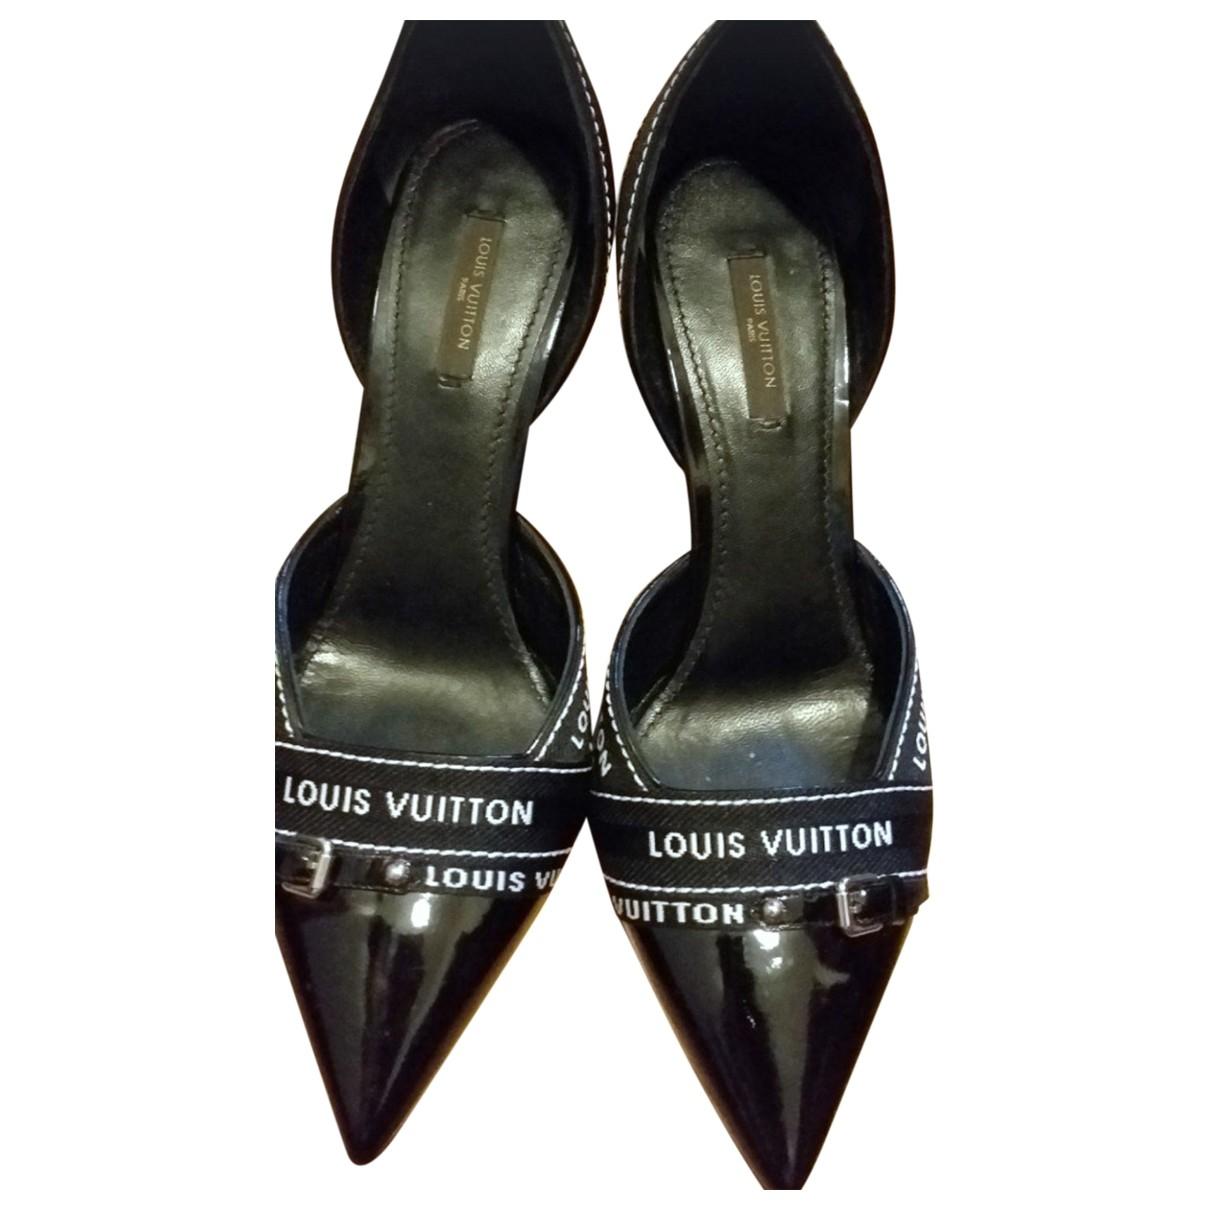 Louis Vuitton \N Black Patent leather Heels for Women 39.5 EU